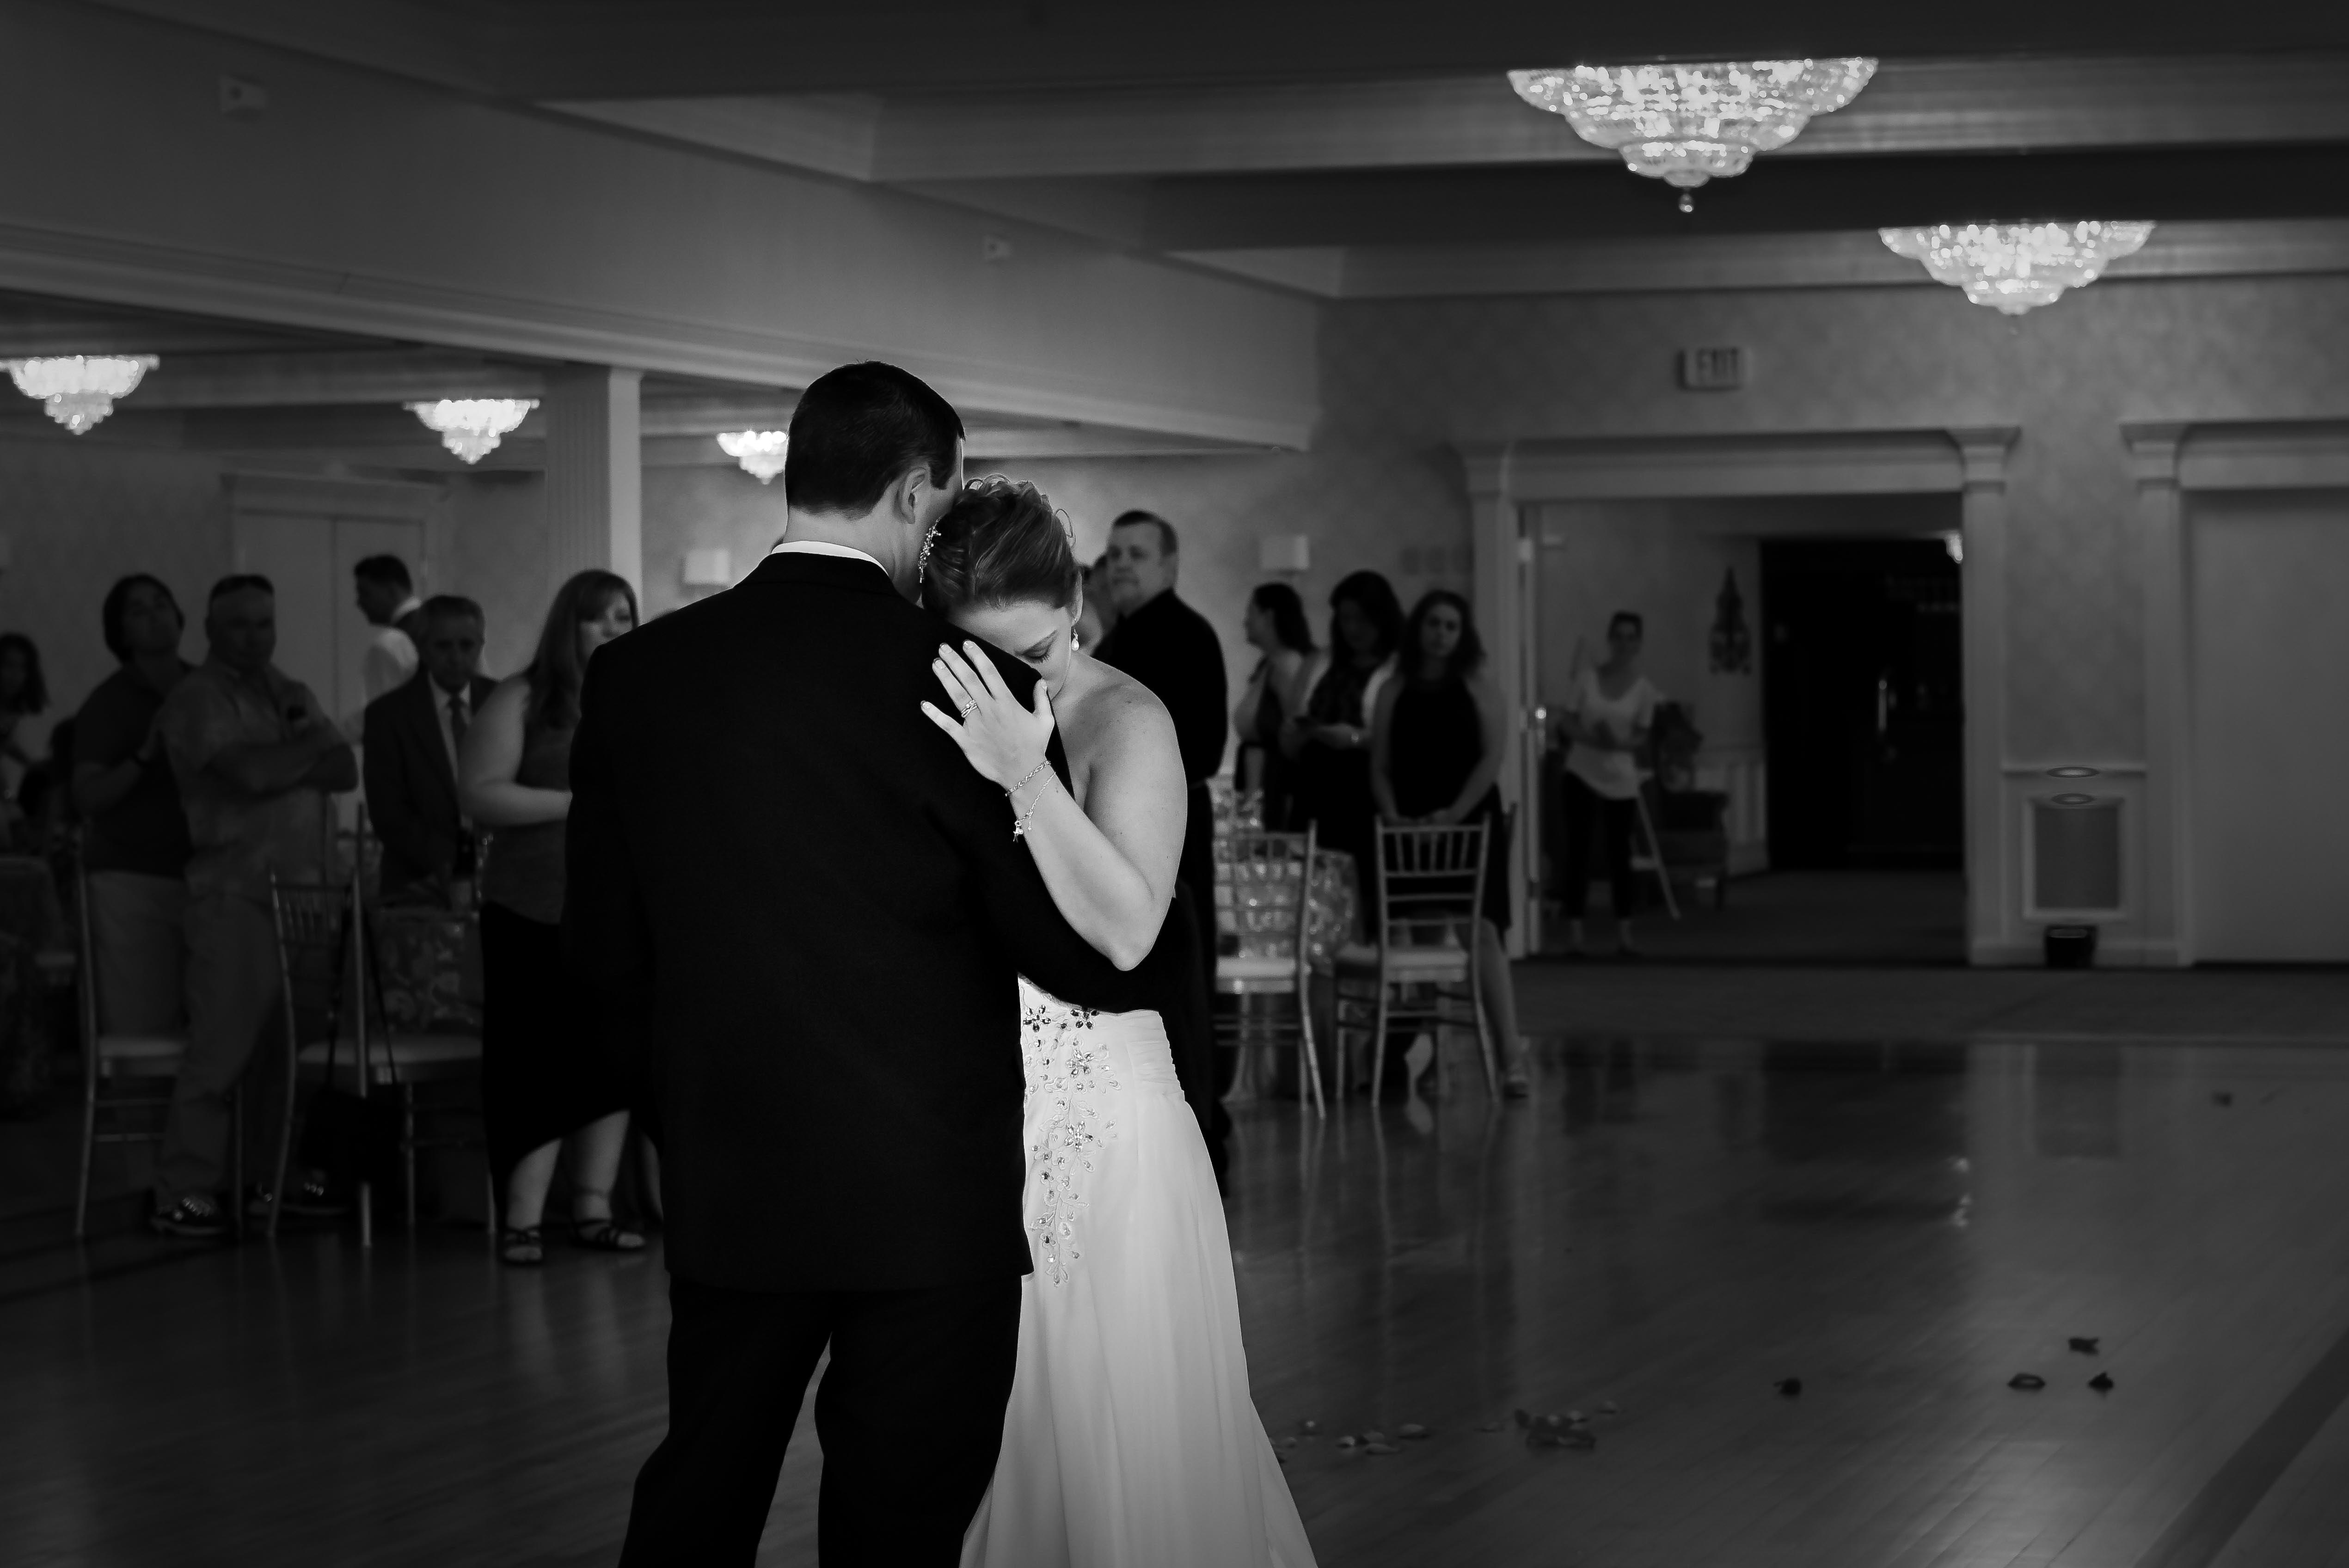 black and white first dance photos, wedding day photos, Boston wedding photographer, Mendon, MA wedding photogrpahers, NH wedding photographers